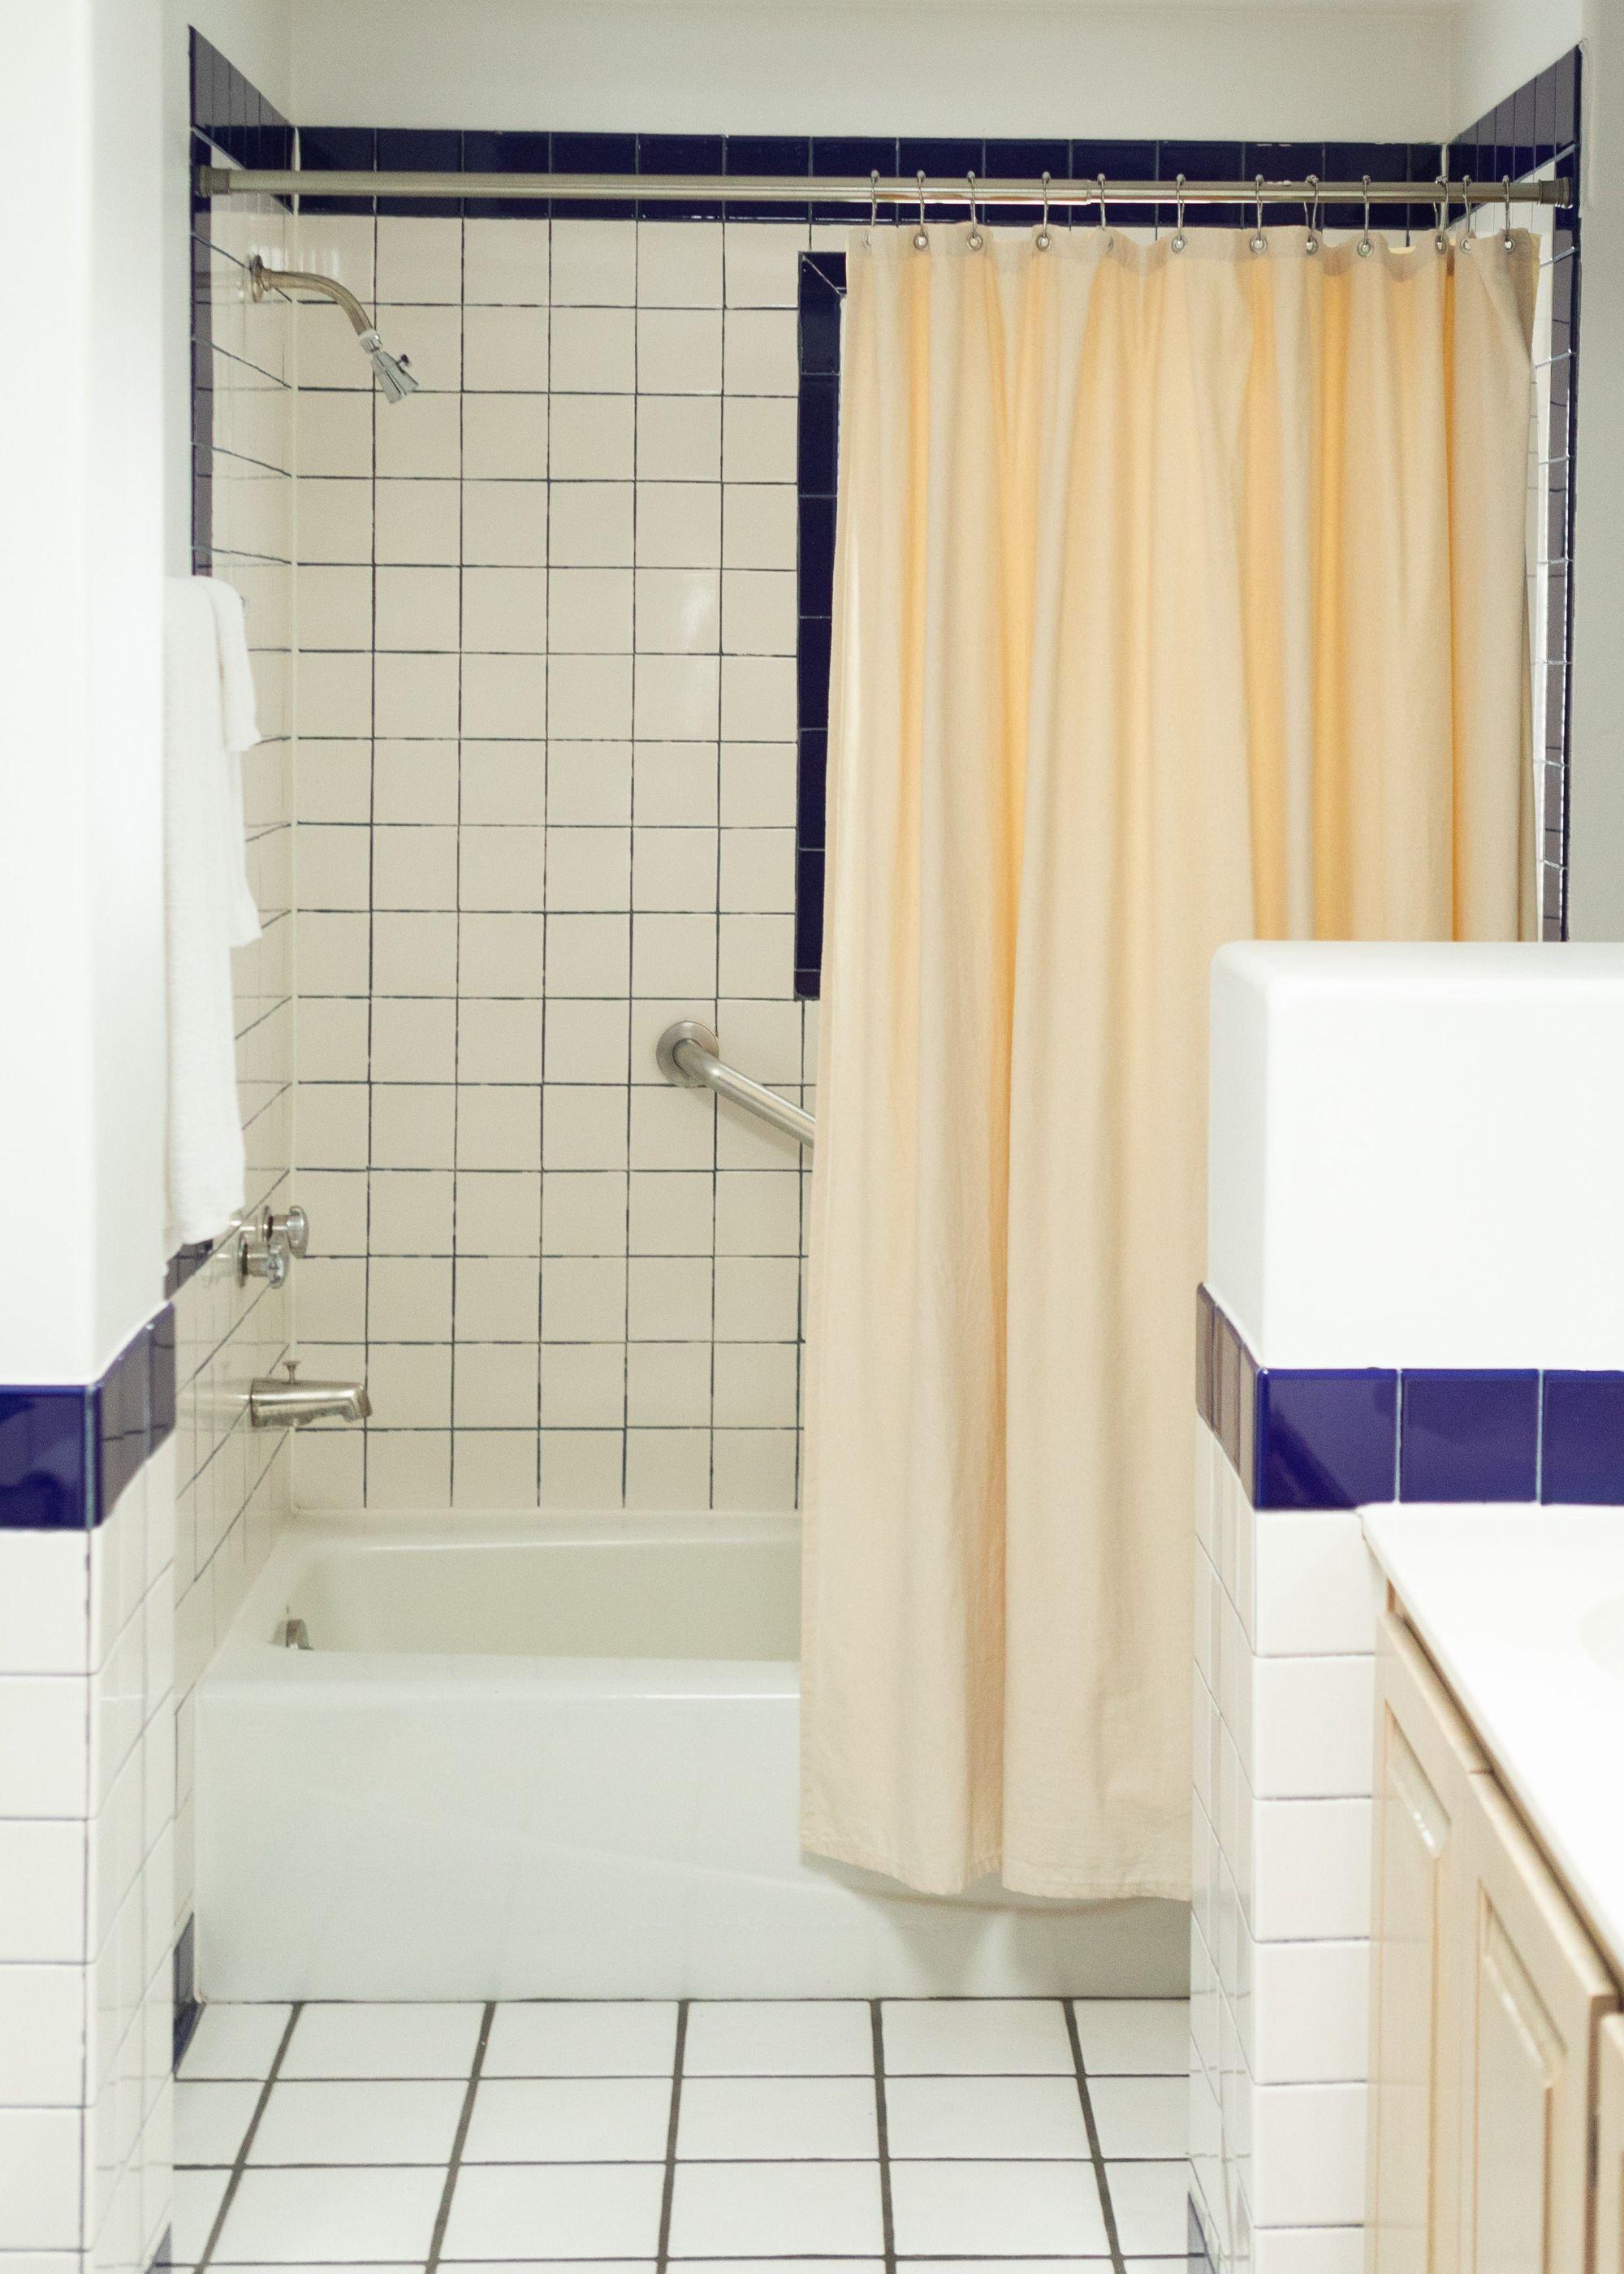 Bathroom 2-20190612104406_v1_current-min.jpg